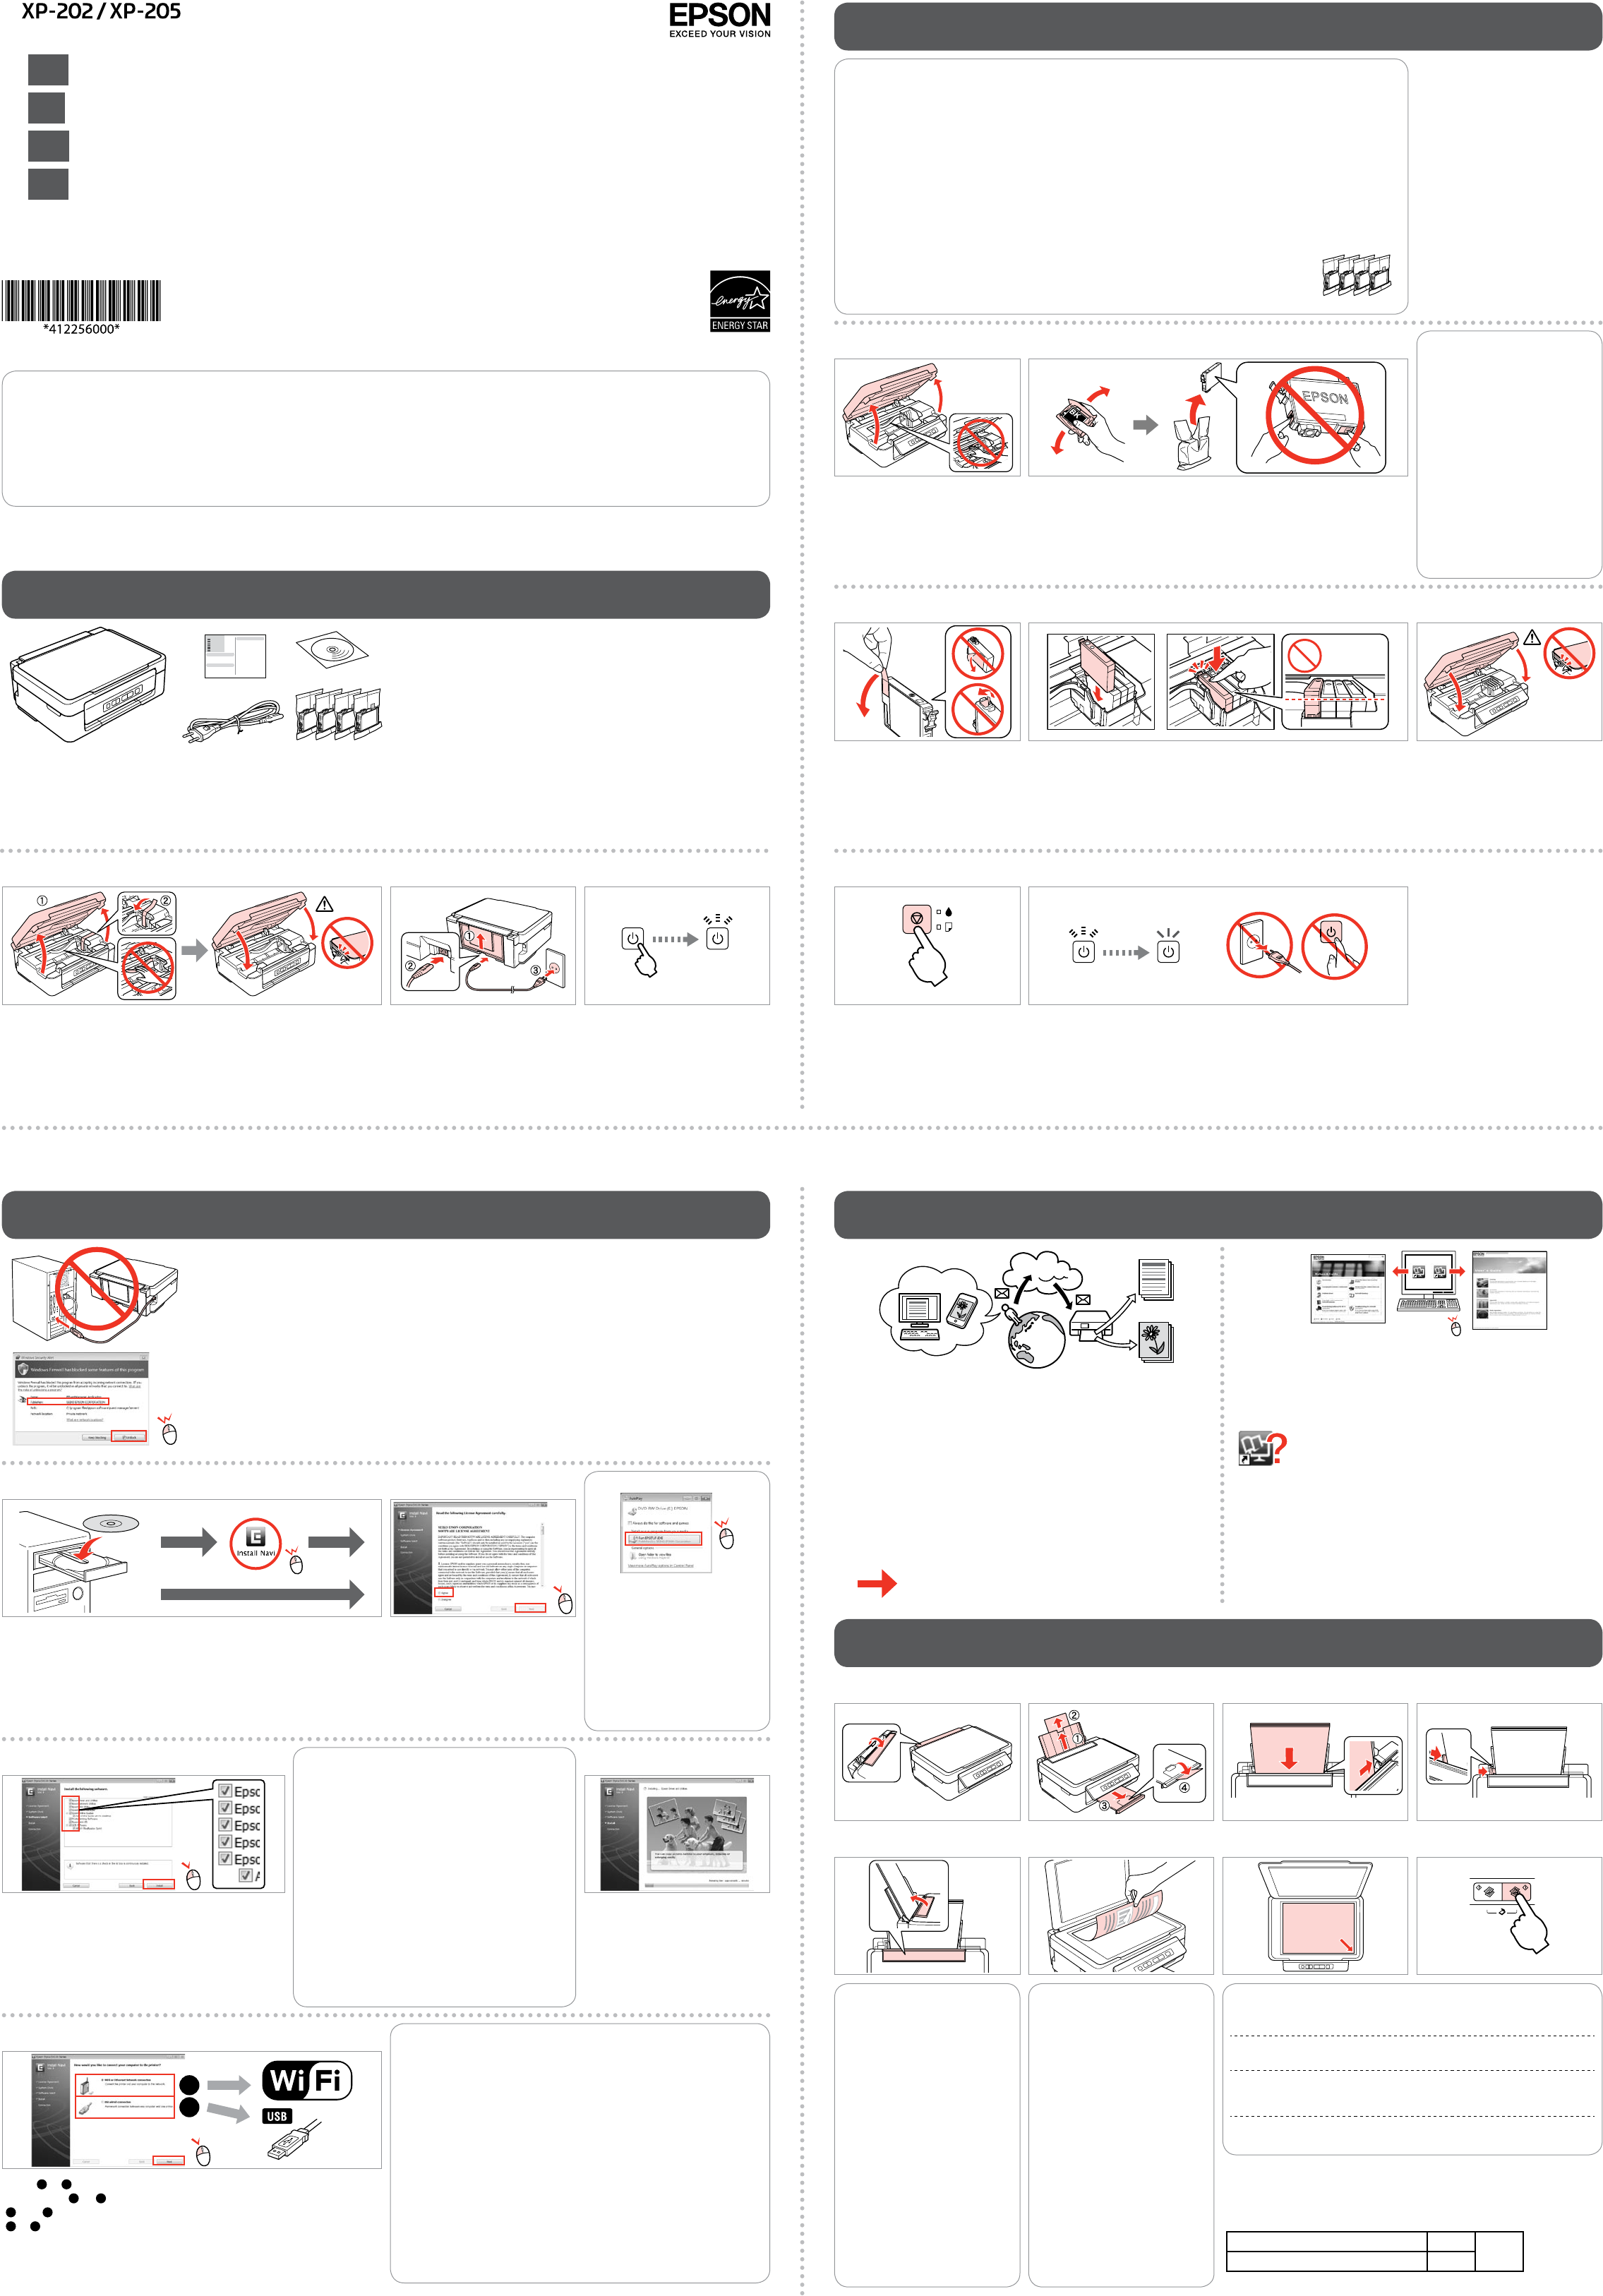 handleiding epson xp 202 pagina 1 van 2 deutsch english espan l fran ais italiano. Black Bedroom Furniture Sets. Home Design Ideas